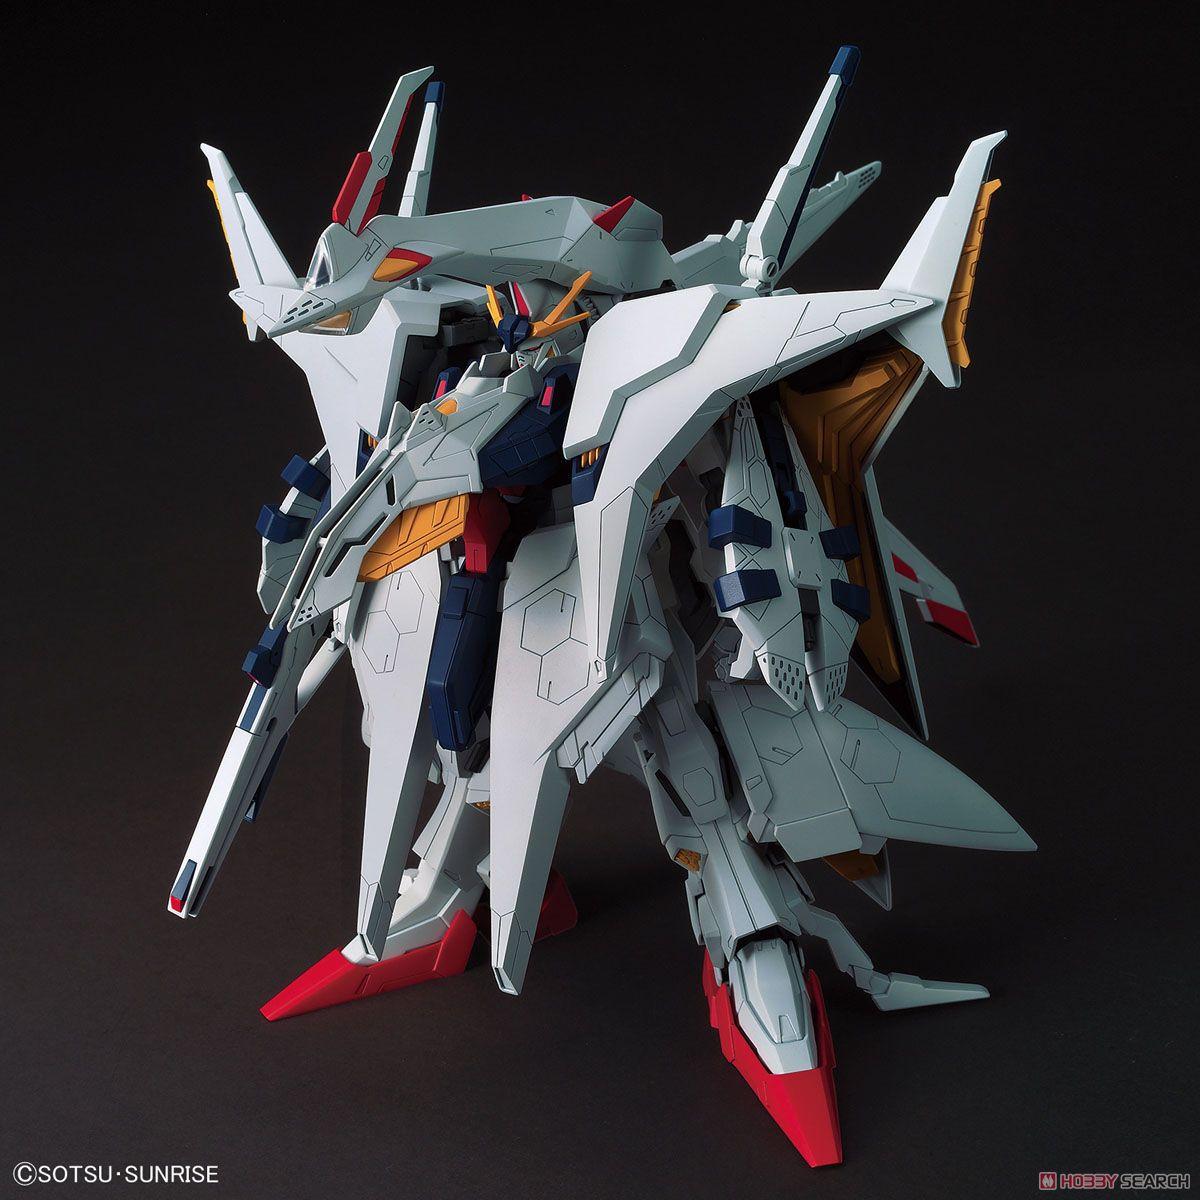 HGUC 1/144『ペーネロペー』機動戦士ガンダム 閃光のハサウェイ プラモデル-002